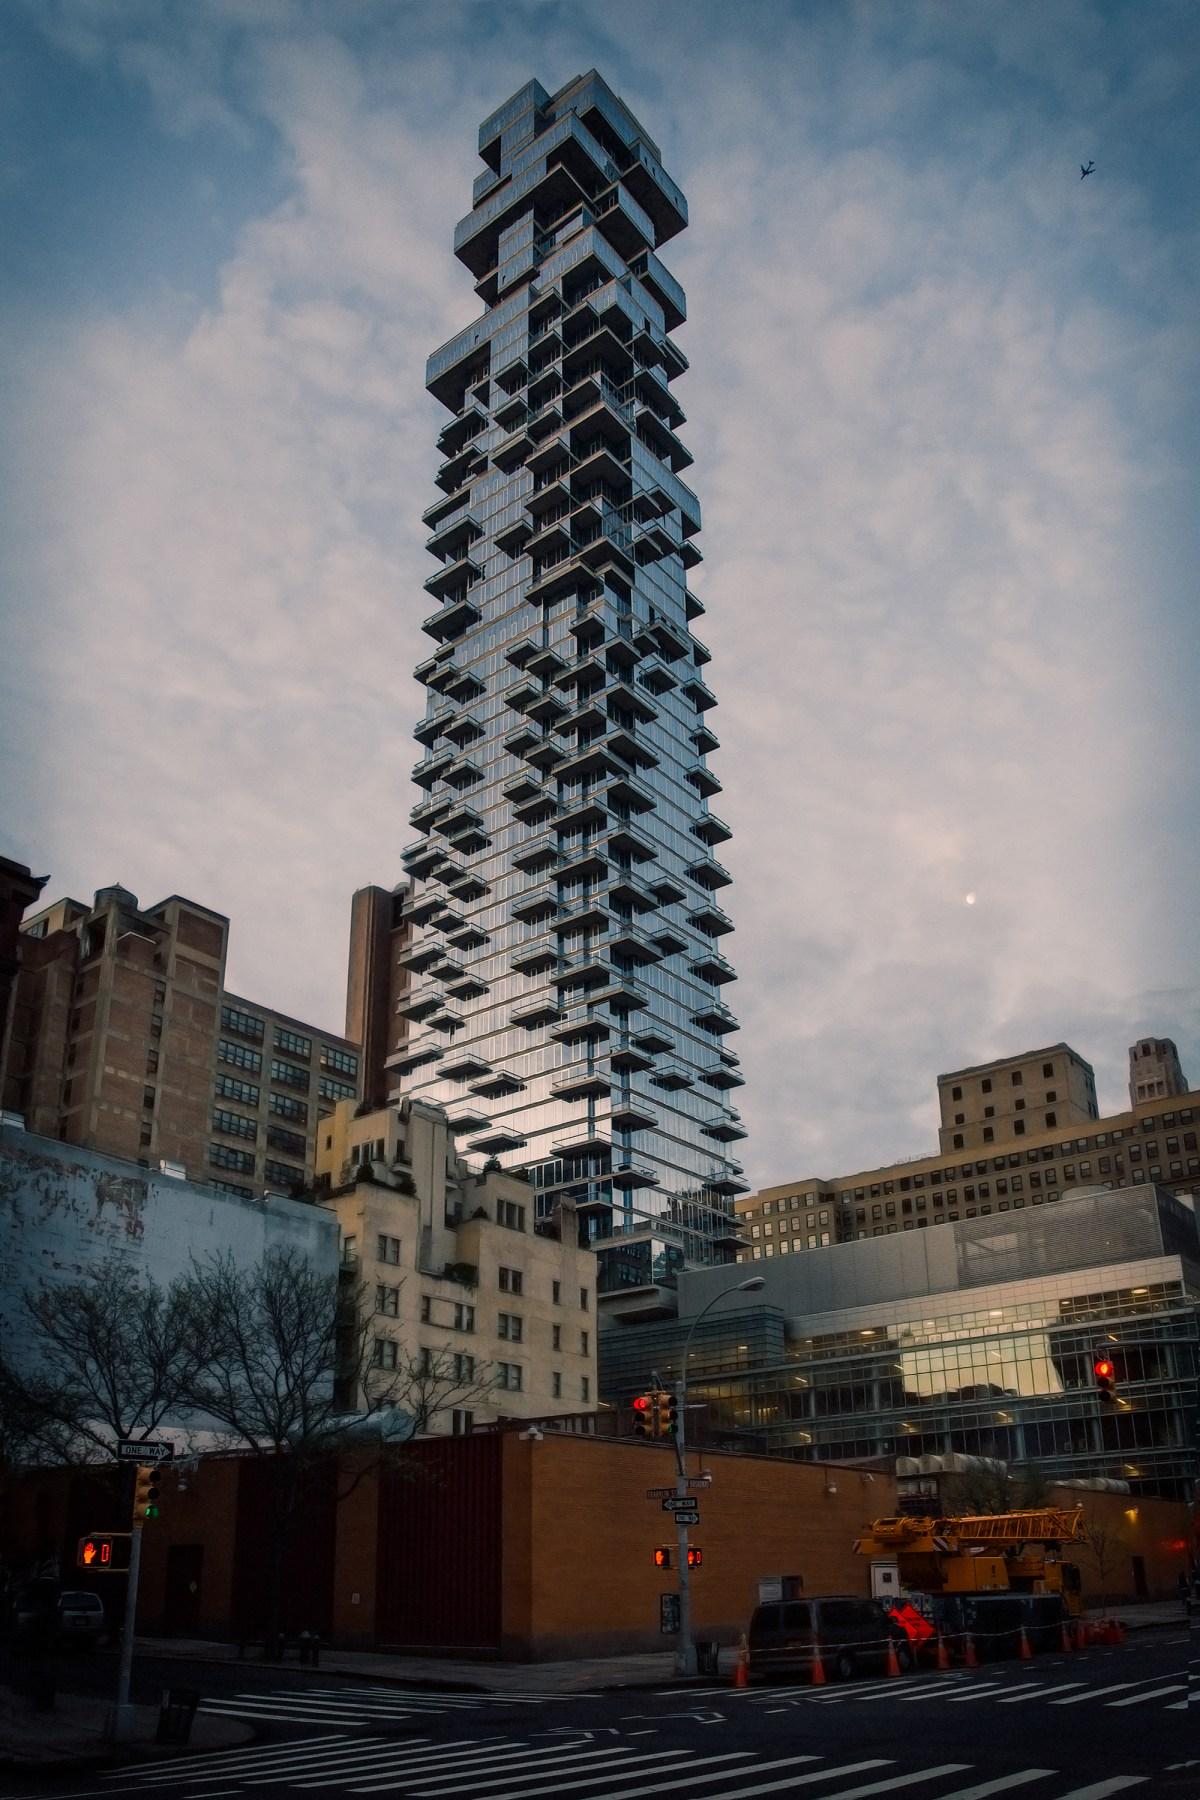 The Jenga Tower @ 56 Leonard Street